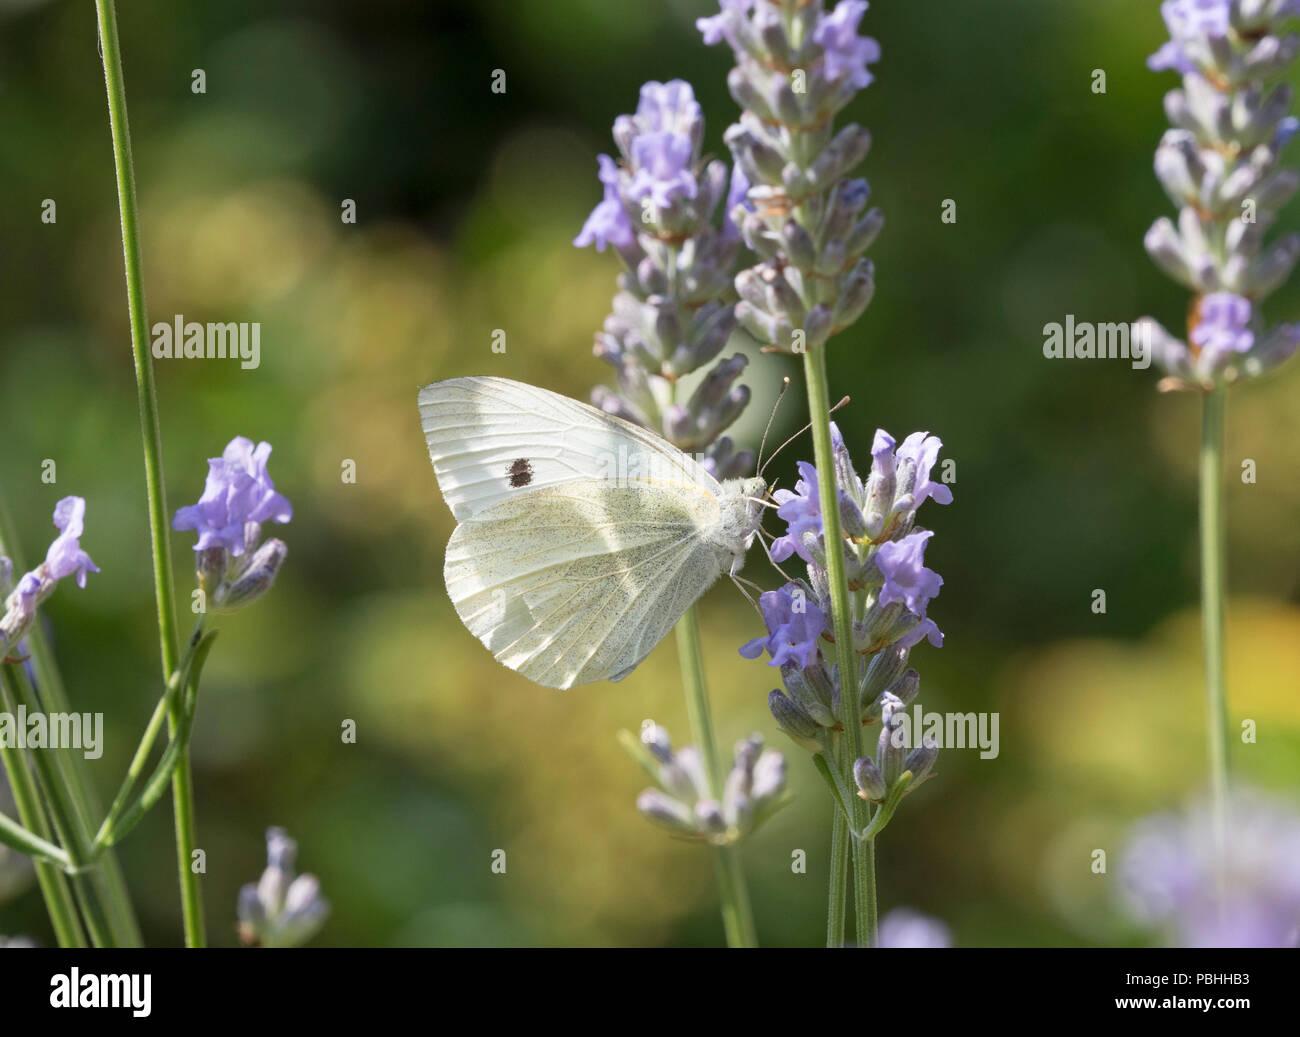 Large White Butterfly, Pieris brassicae, single adult feeding on Lavender Worcestershire, UK - Stock Image